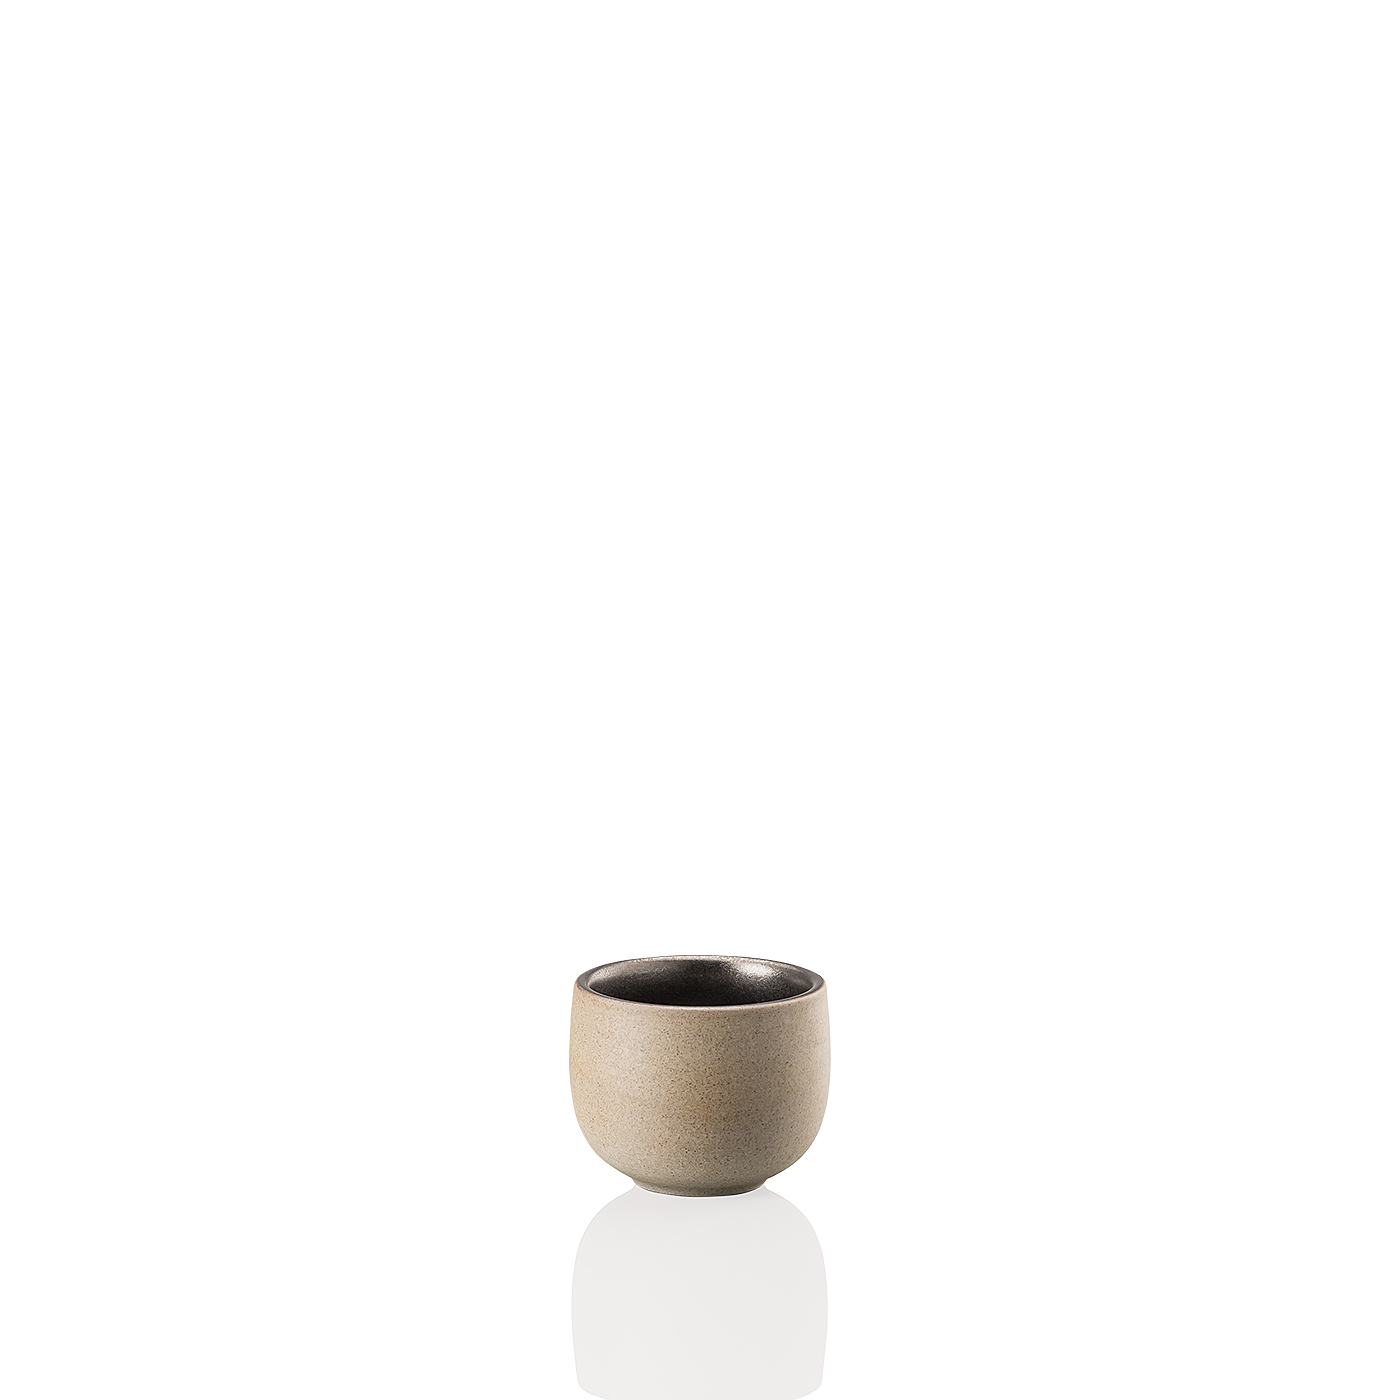 Espressoschale Joyn Stoneware Iron Arzberg